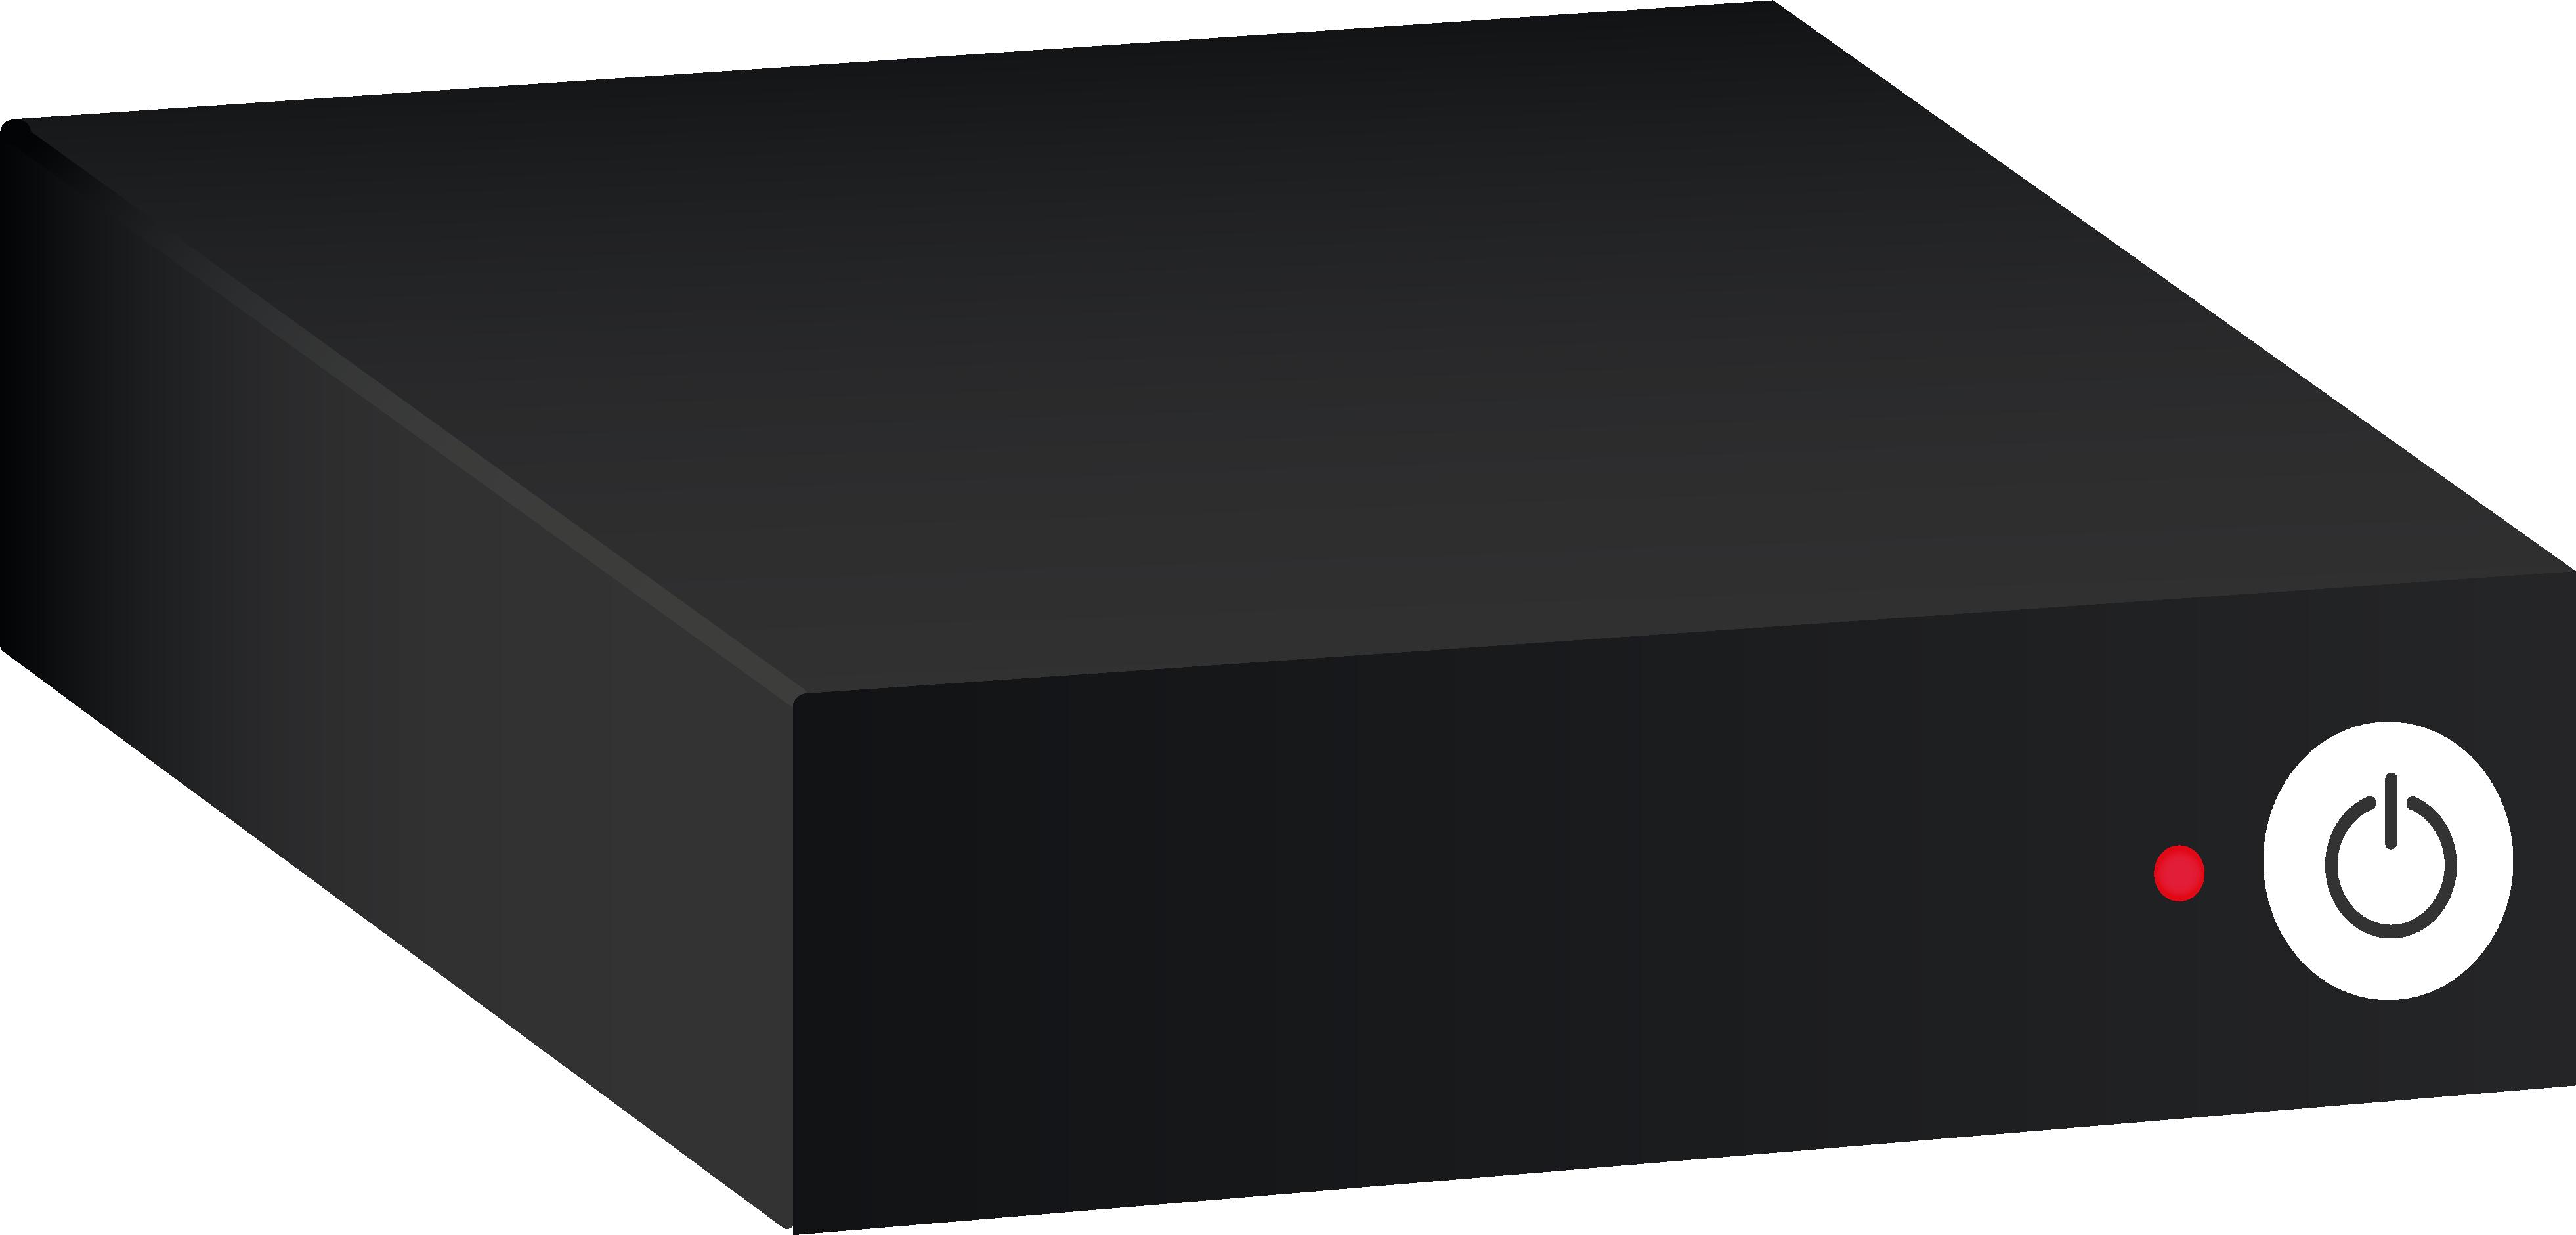 IAGONA Iagona Neobox Starter (S)